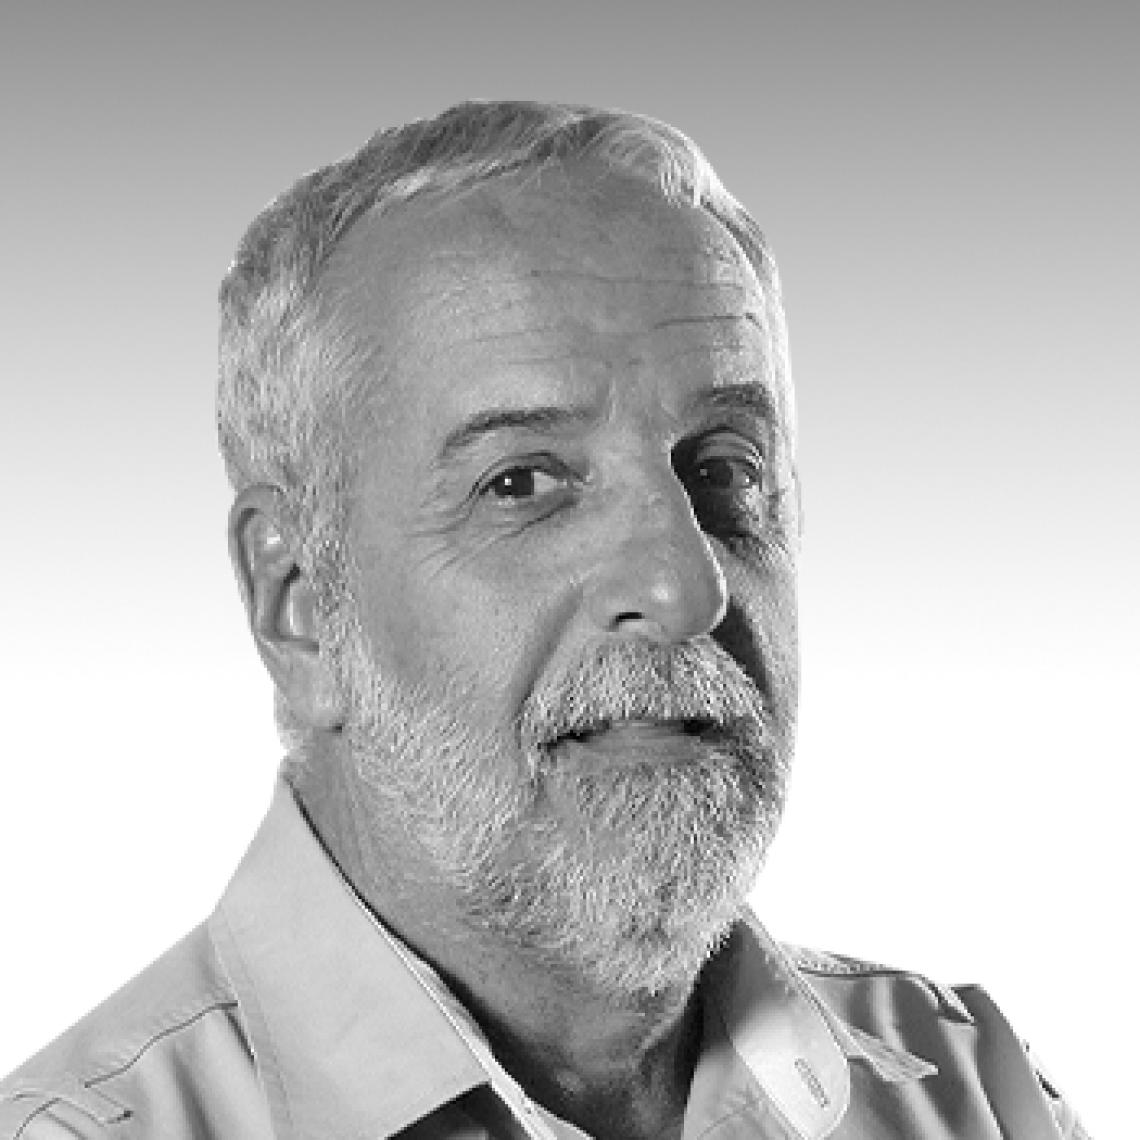 Sérgio Redes